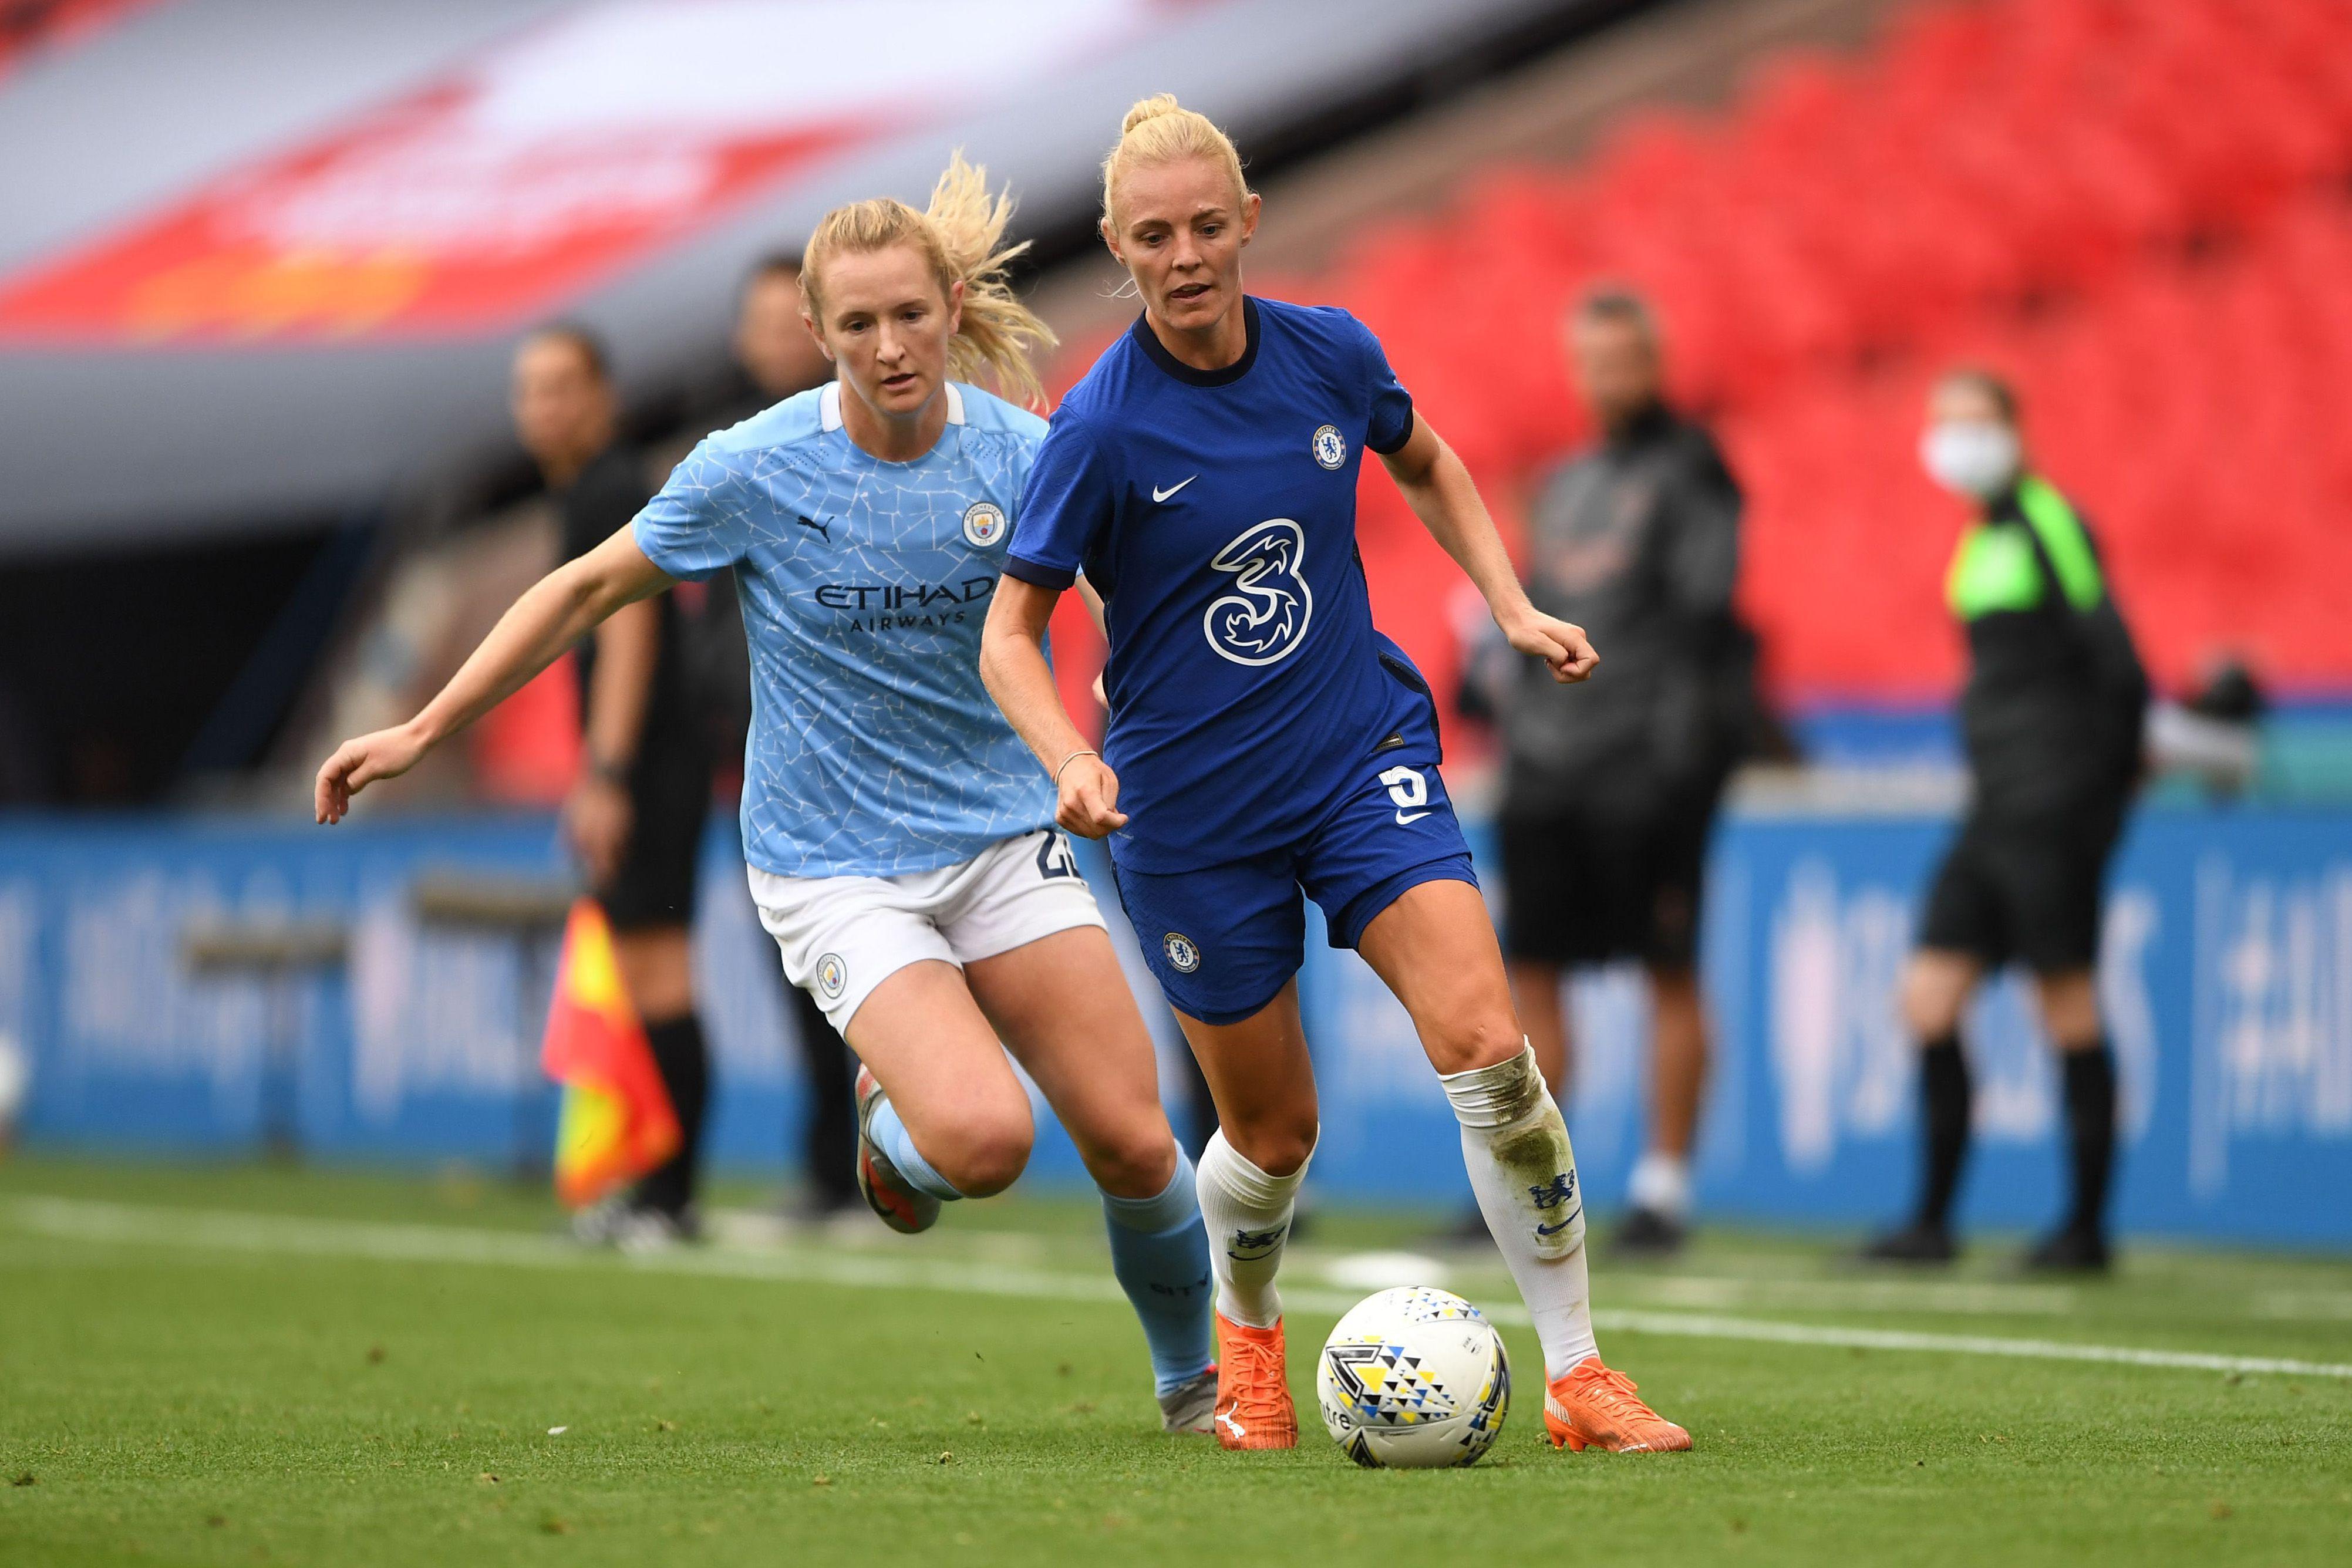 Chelsea v Manchester City - Women's FA Community Shield